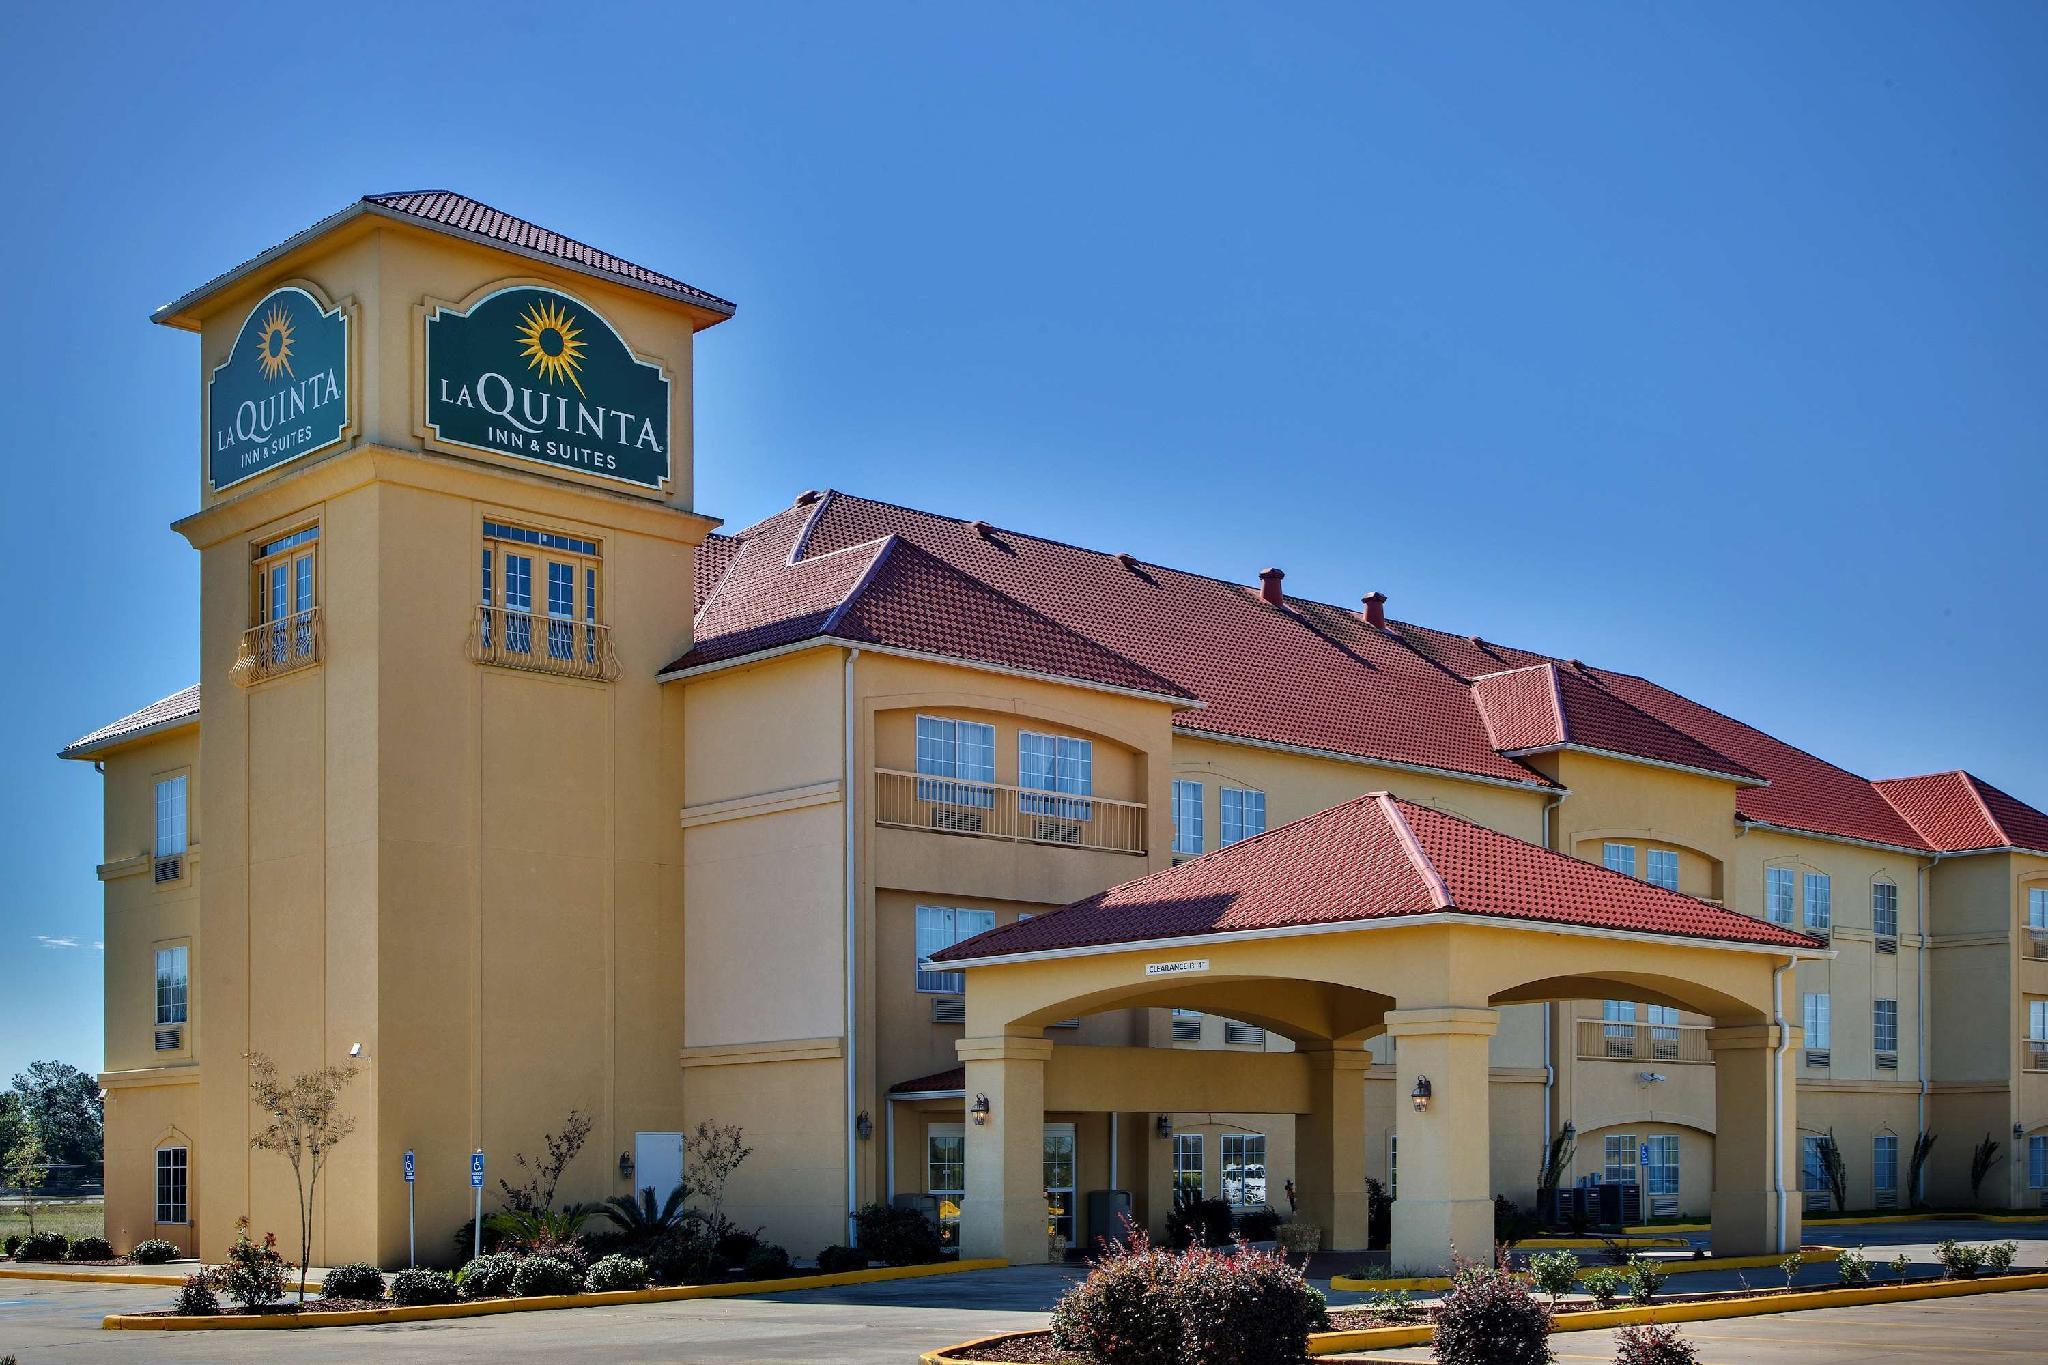 La Quinta Inn And Suites By Wyndham Iowa